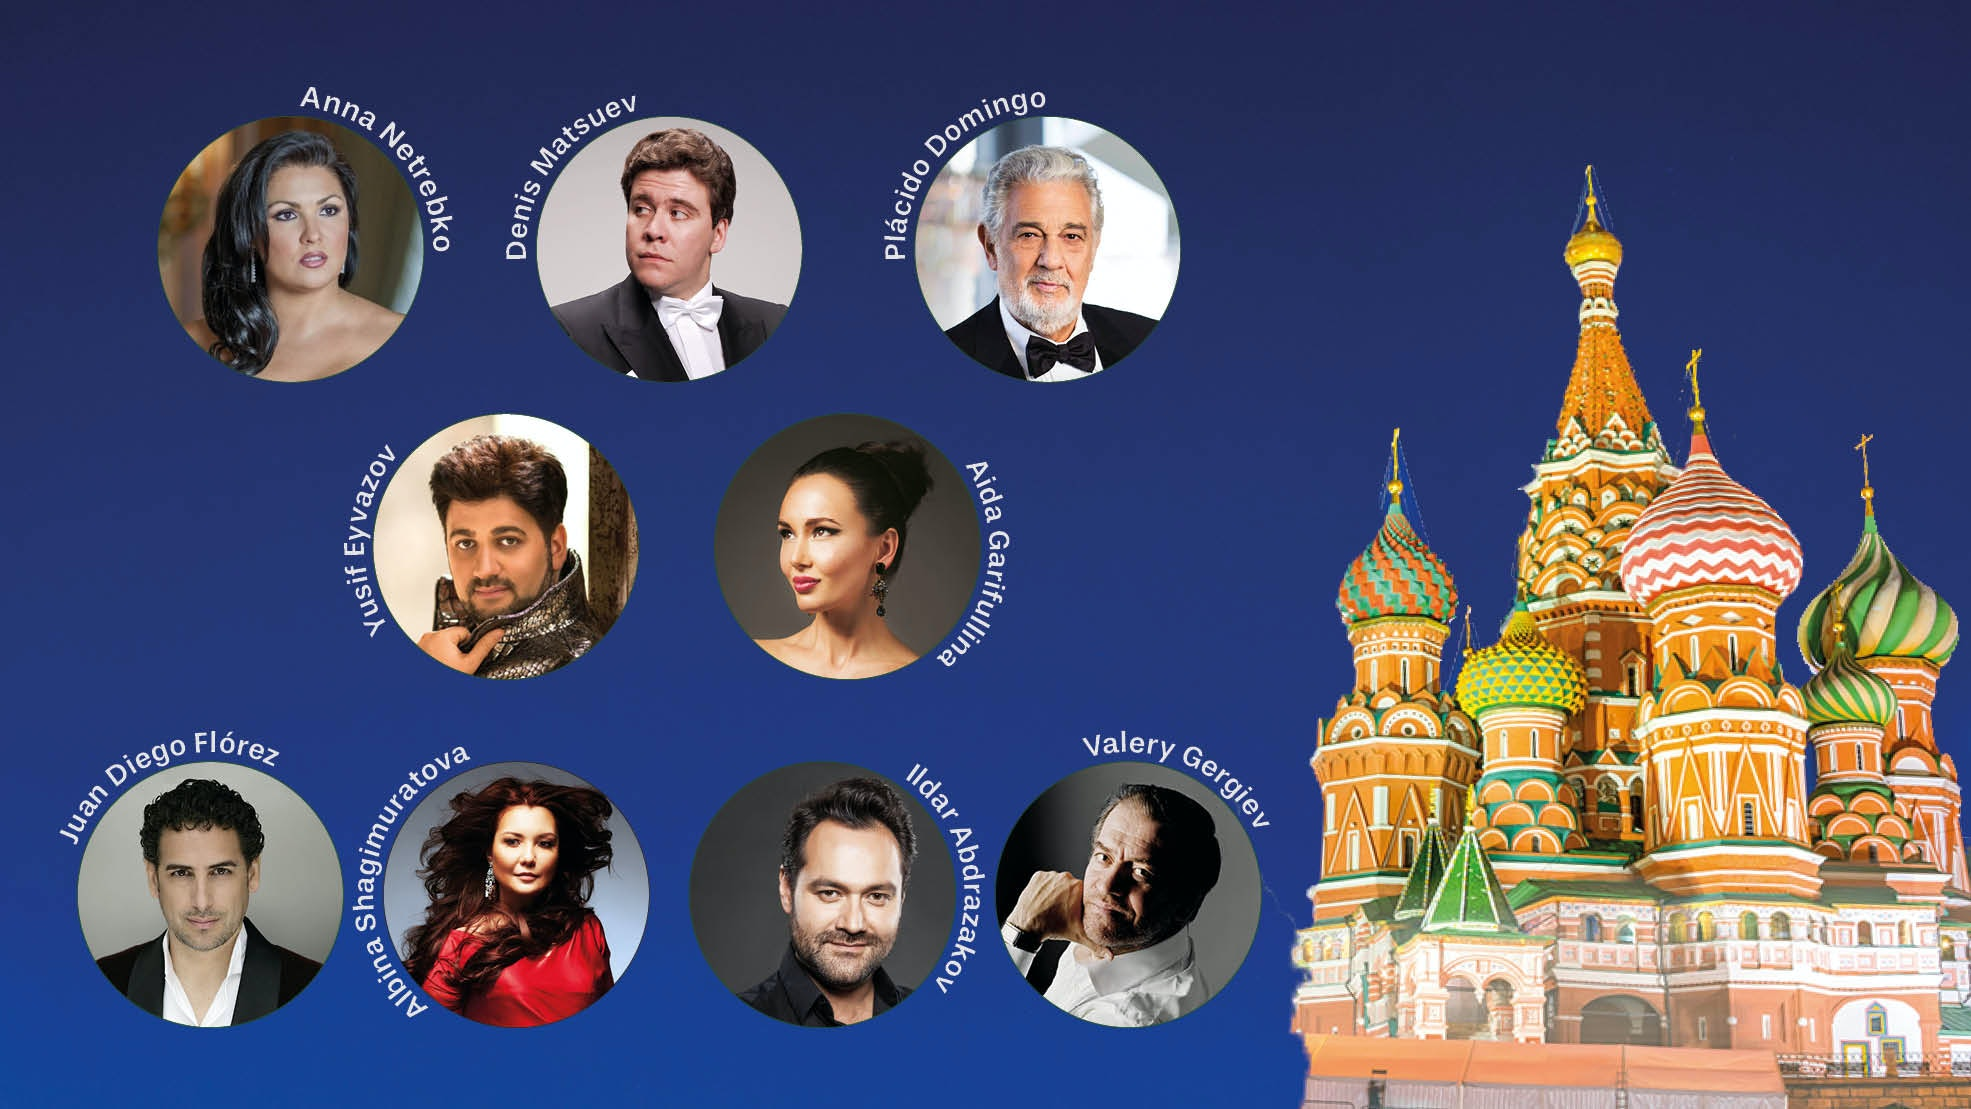 ⚽ Concert de gala de la Coupe du Monde 2018 – Avec  Anna Netrebko, Plácido Domingo, Denis Matsuev, Valery Gergiev...